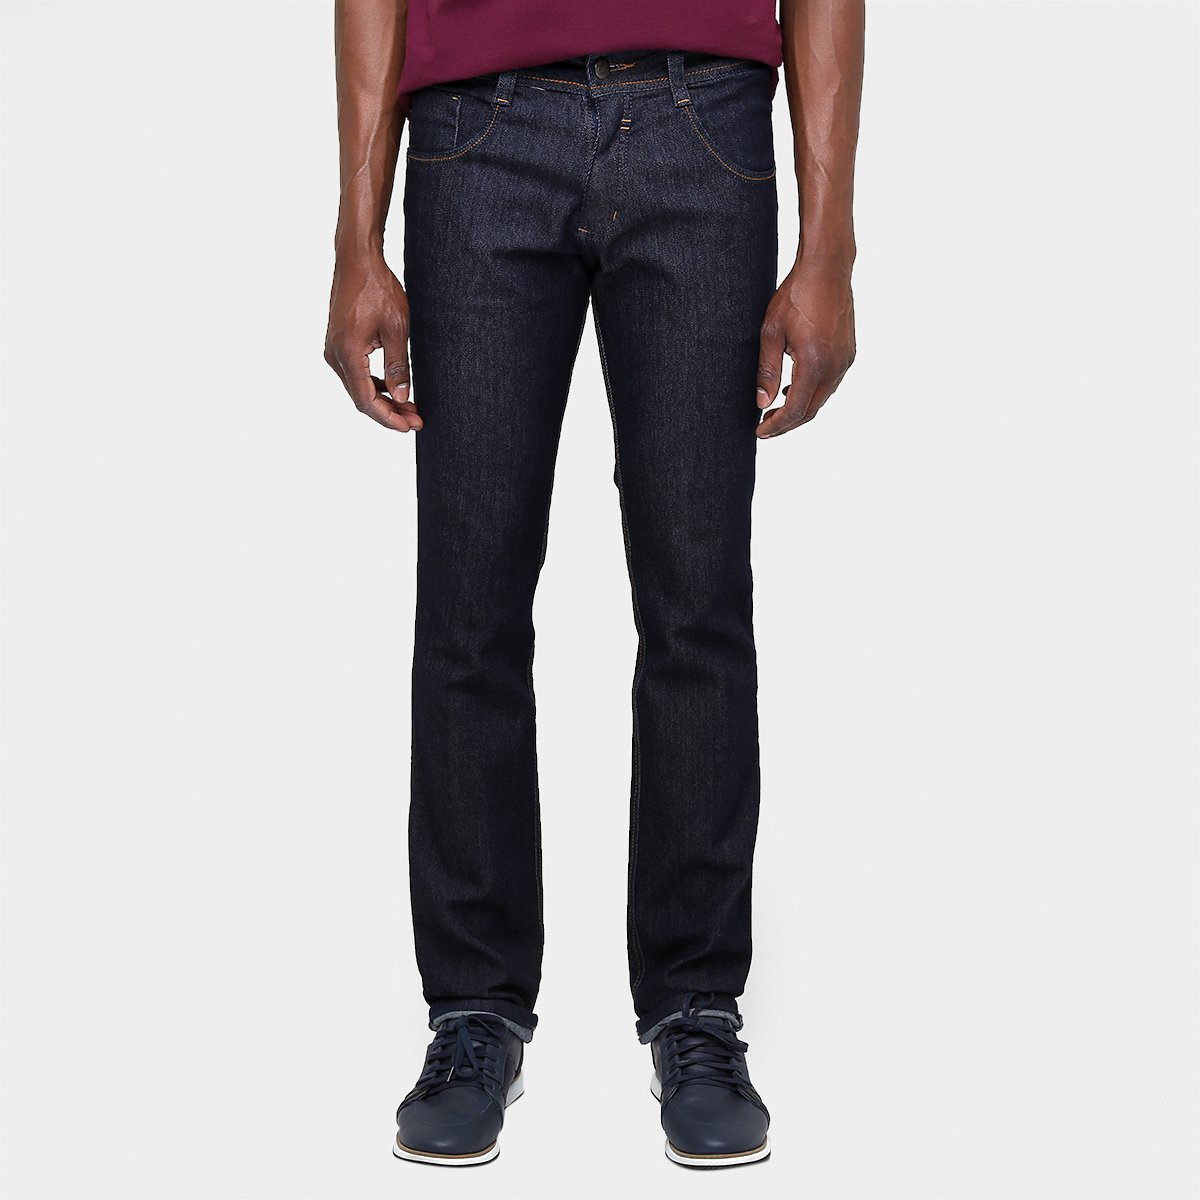 Calça Jeans Biotipo Super Escura